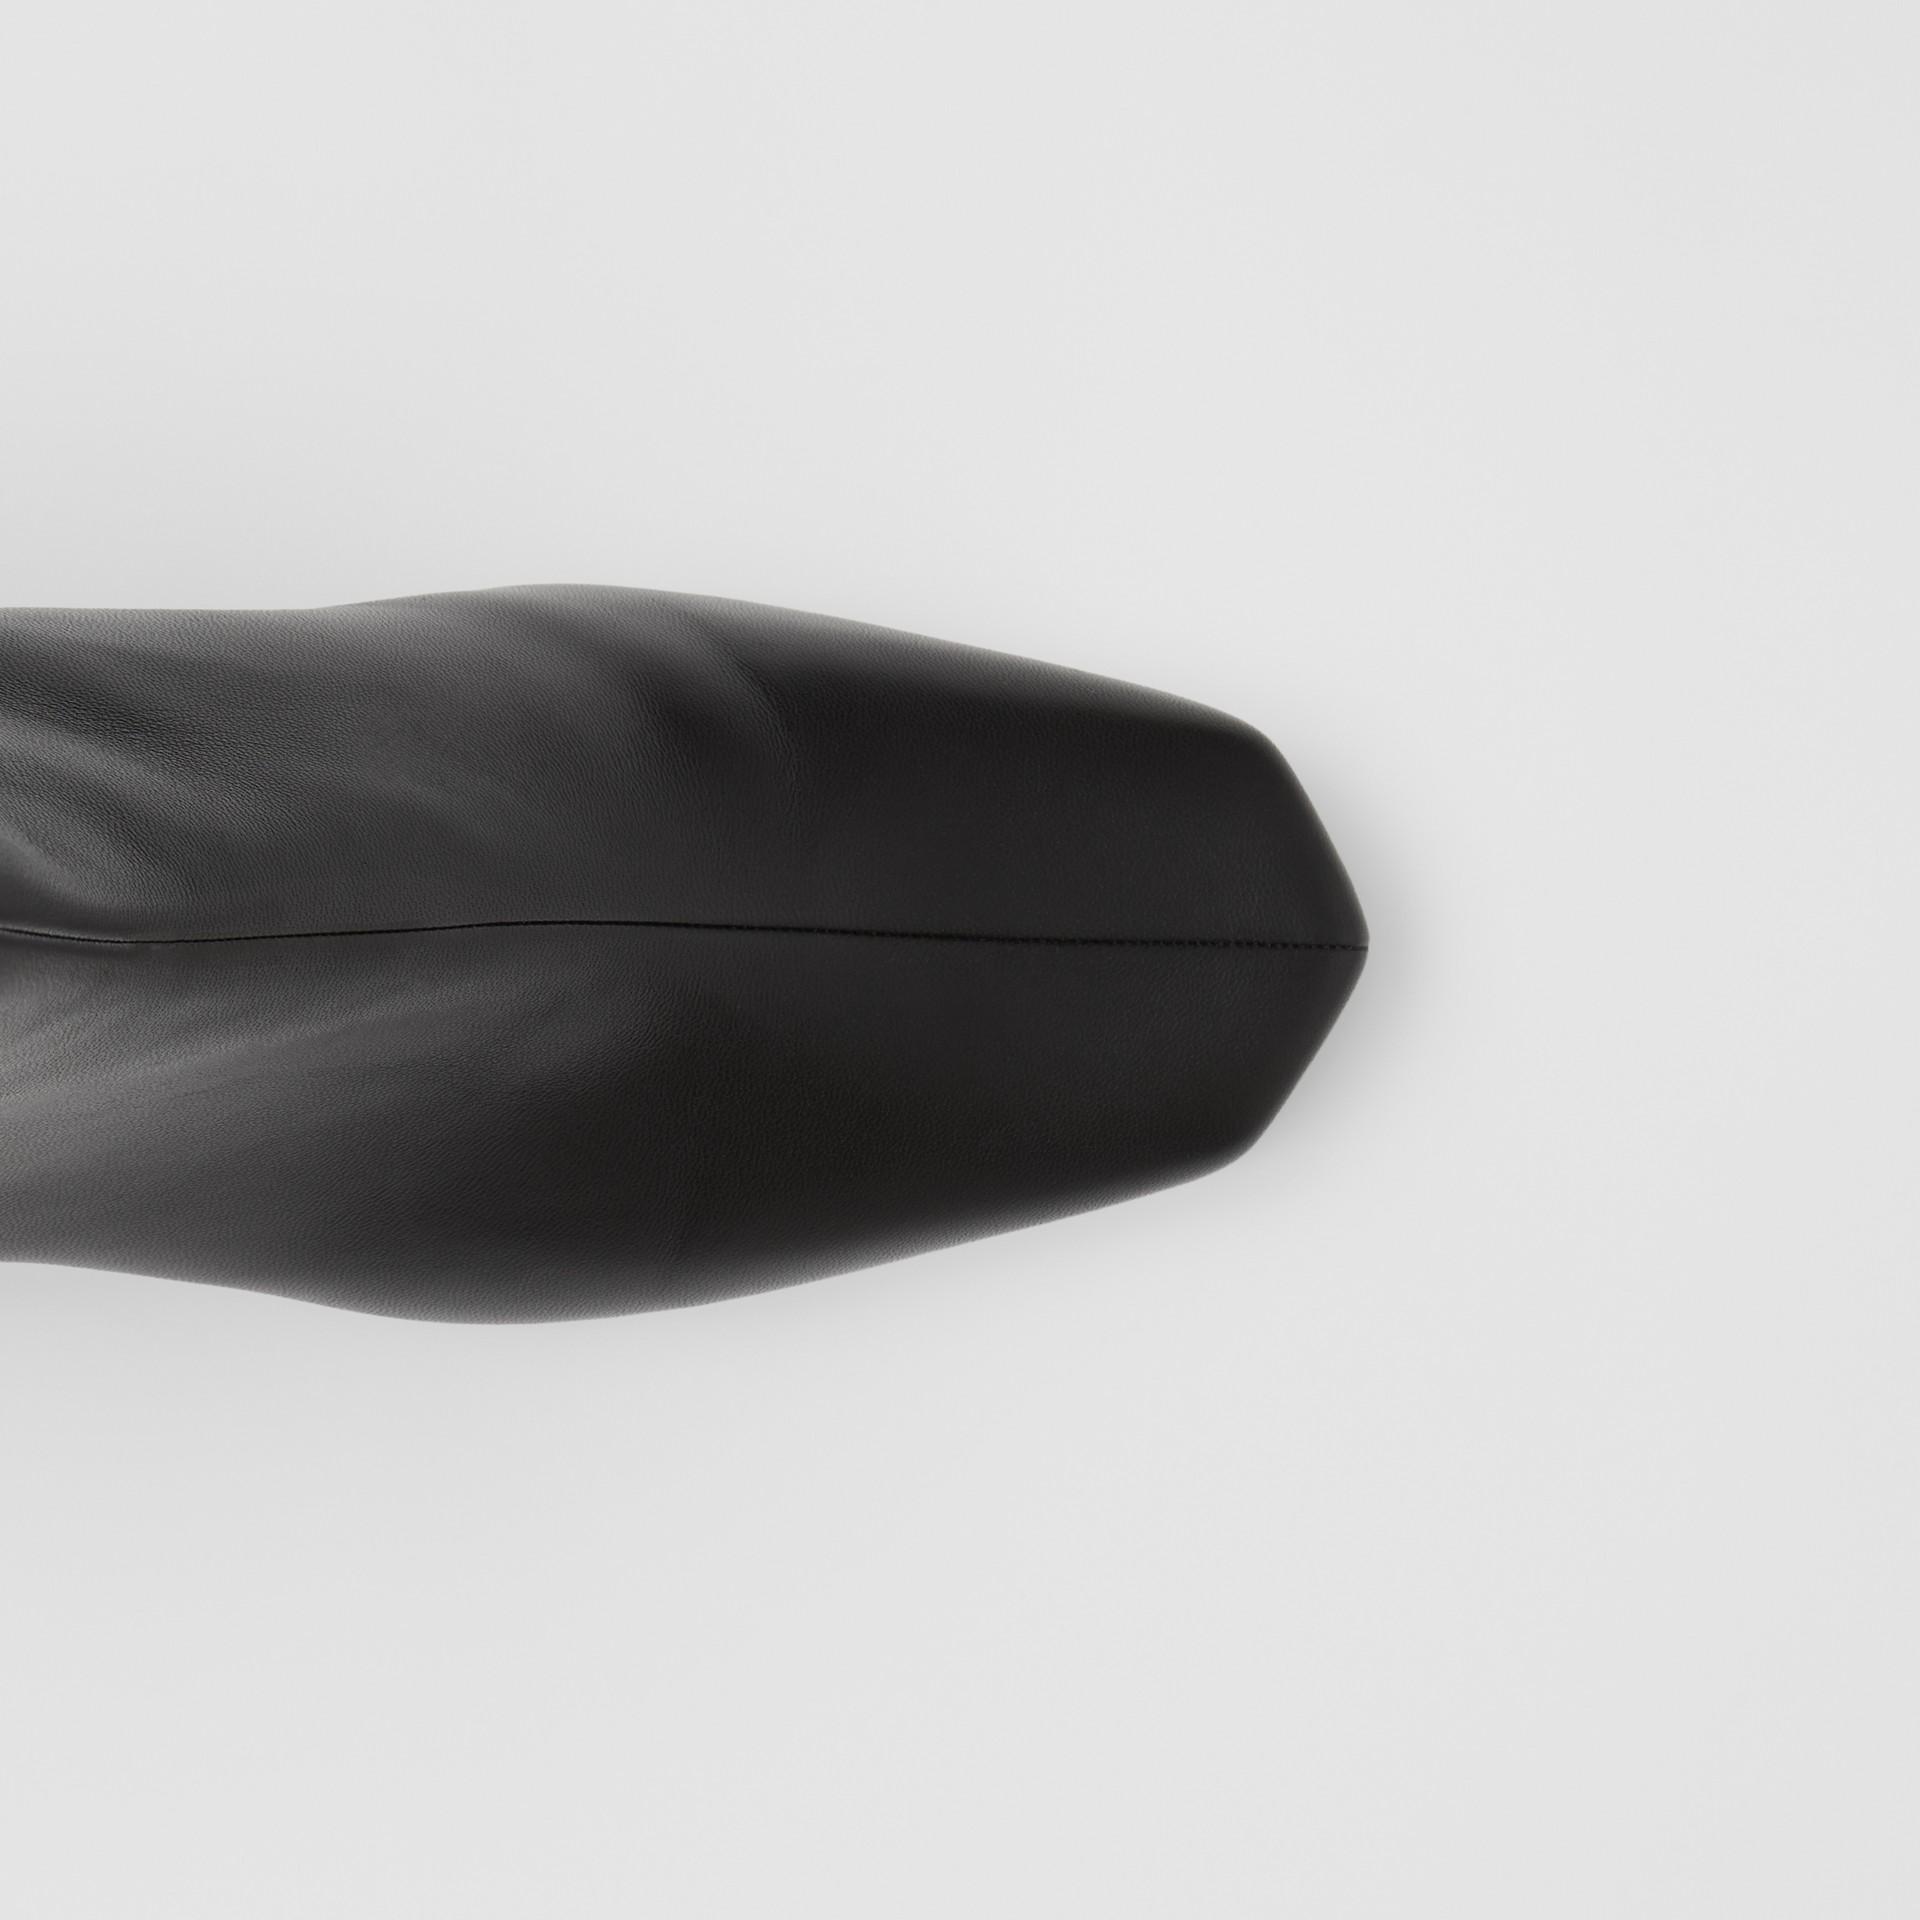 Lambskin Sculptural Kitten-heel Ankle Boots in Black - Women | Burberry - gallery image 1